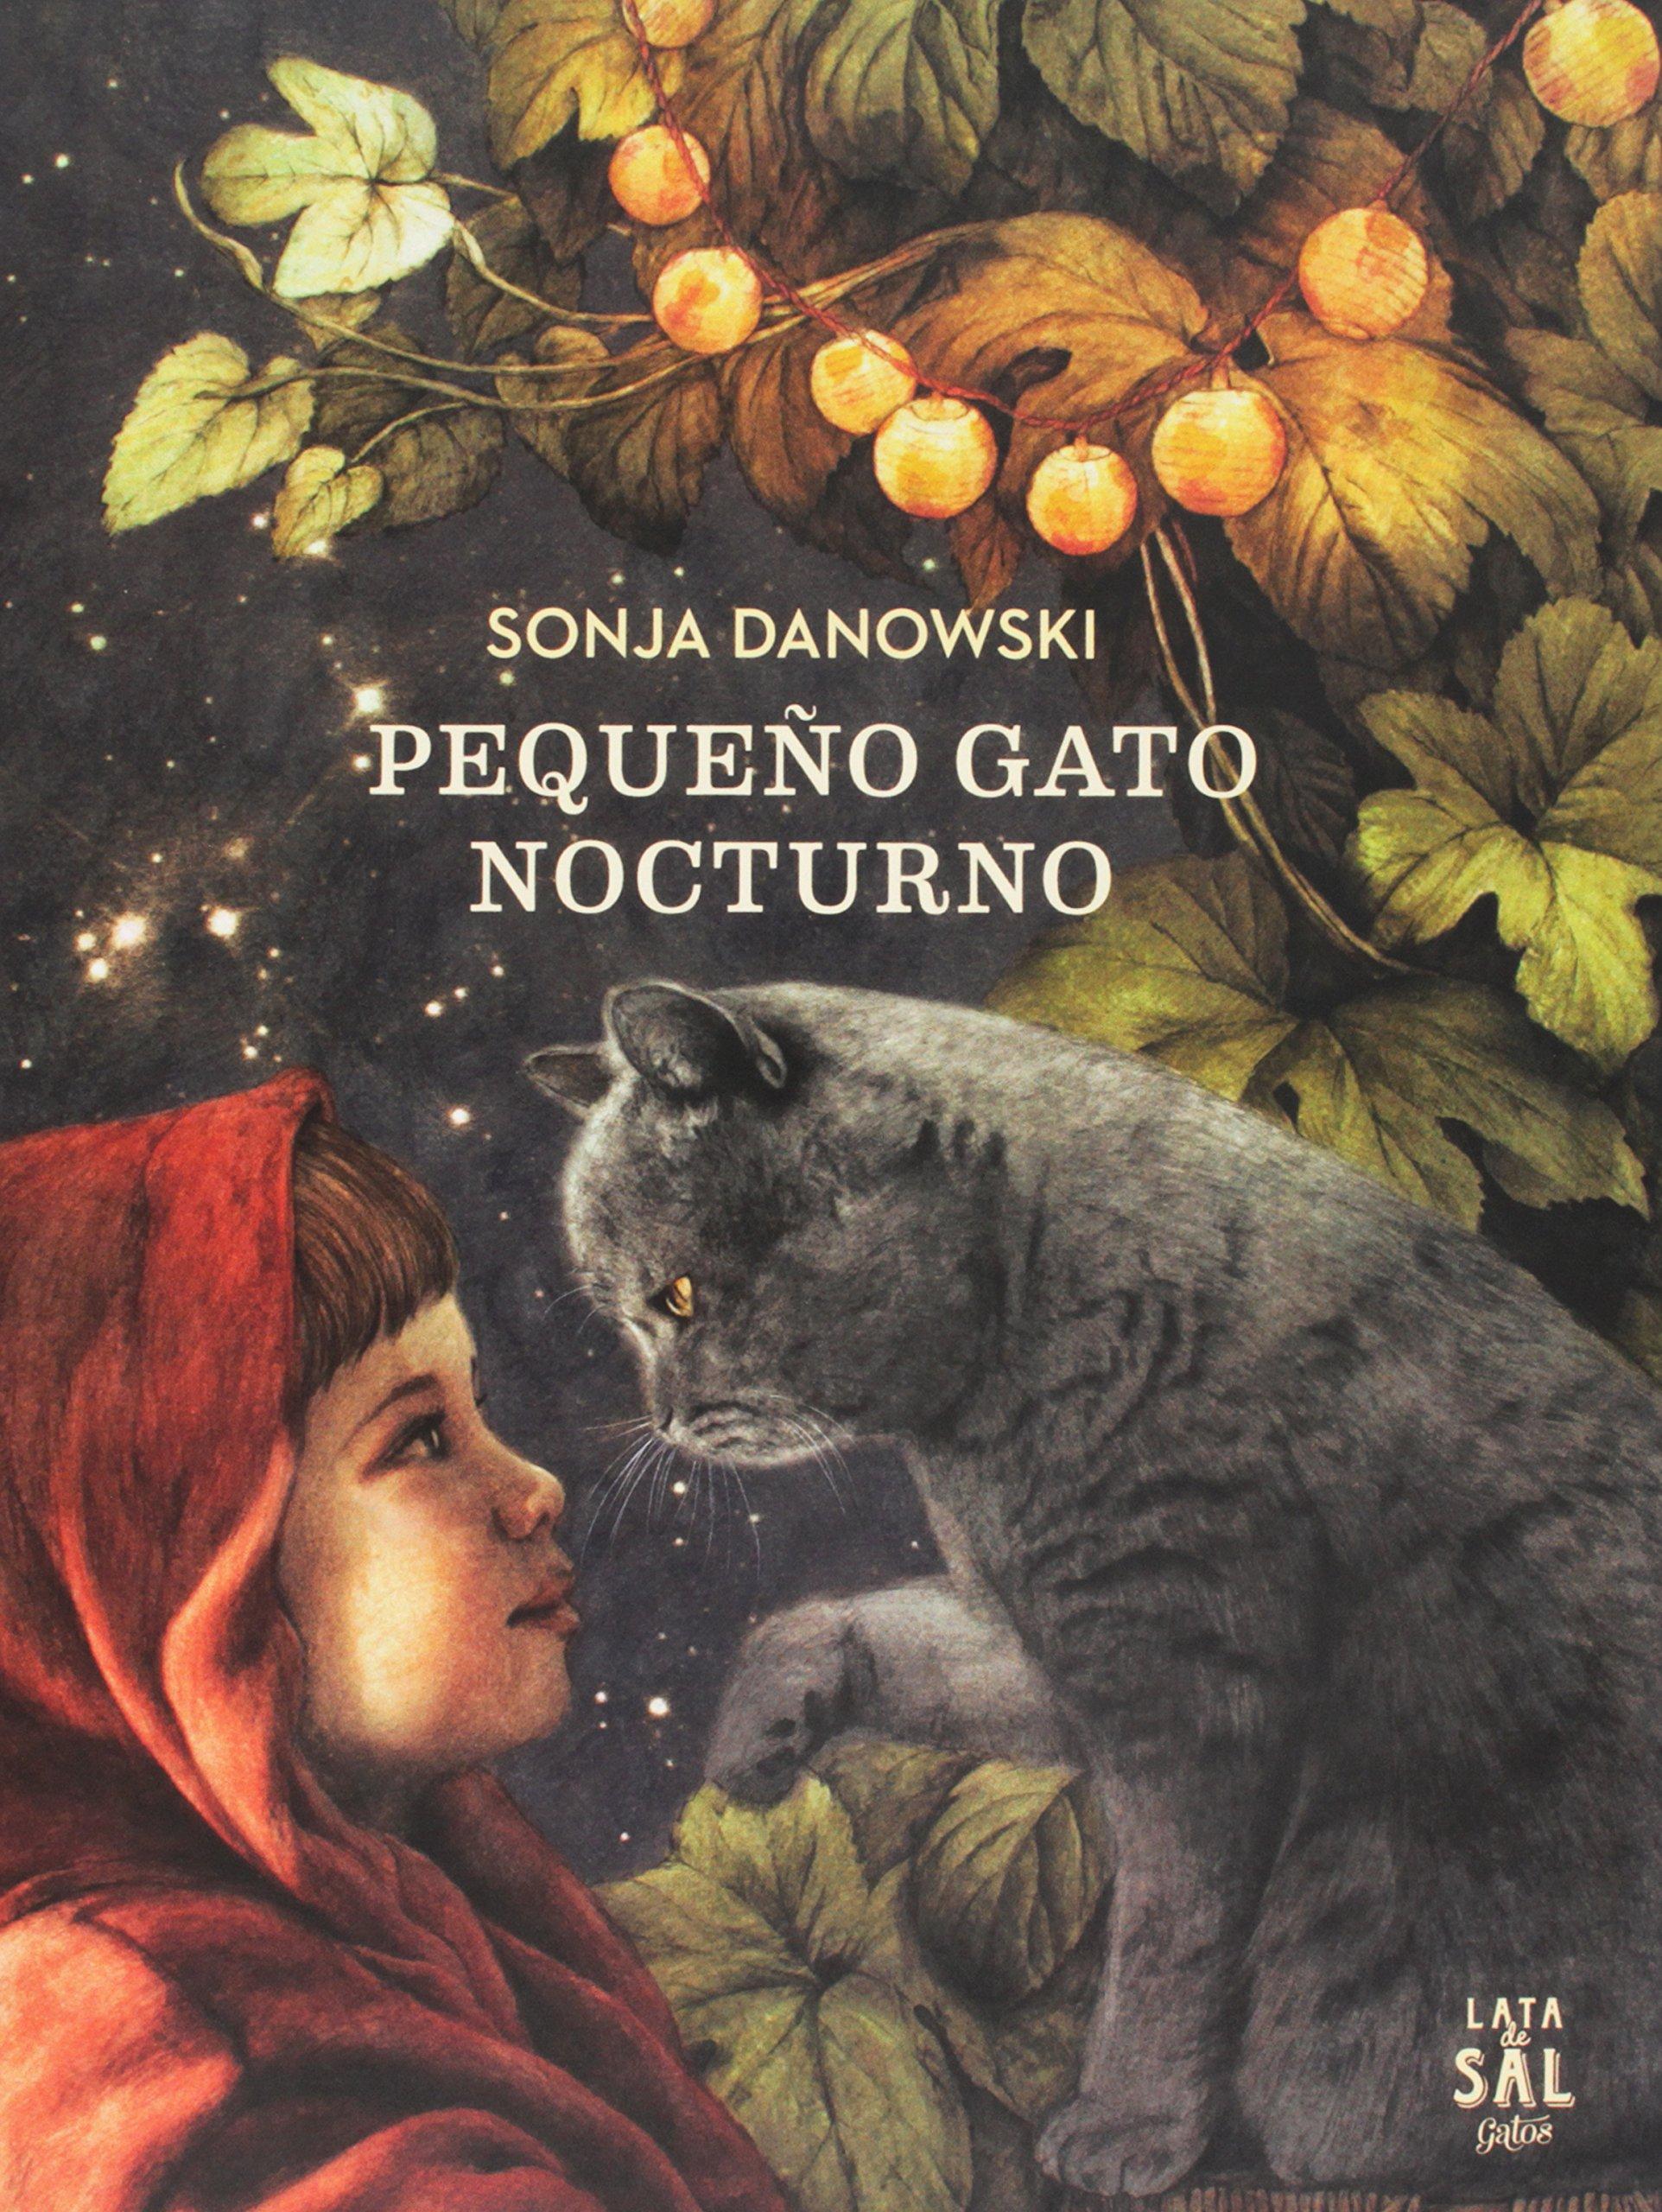 Pequeño gato nocturno/Little Night Cat (Spanish Edition) (Spanish) Hardcover – April 30, 2018